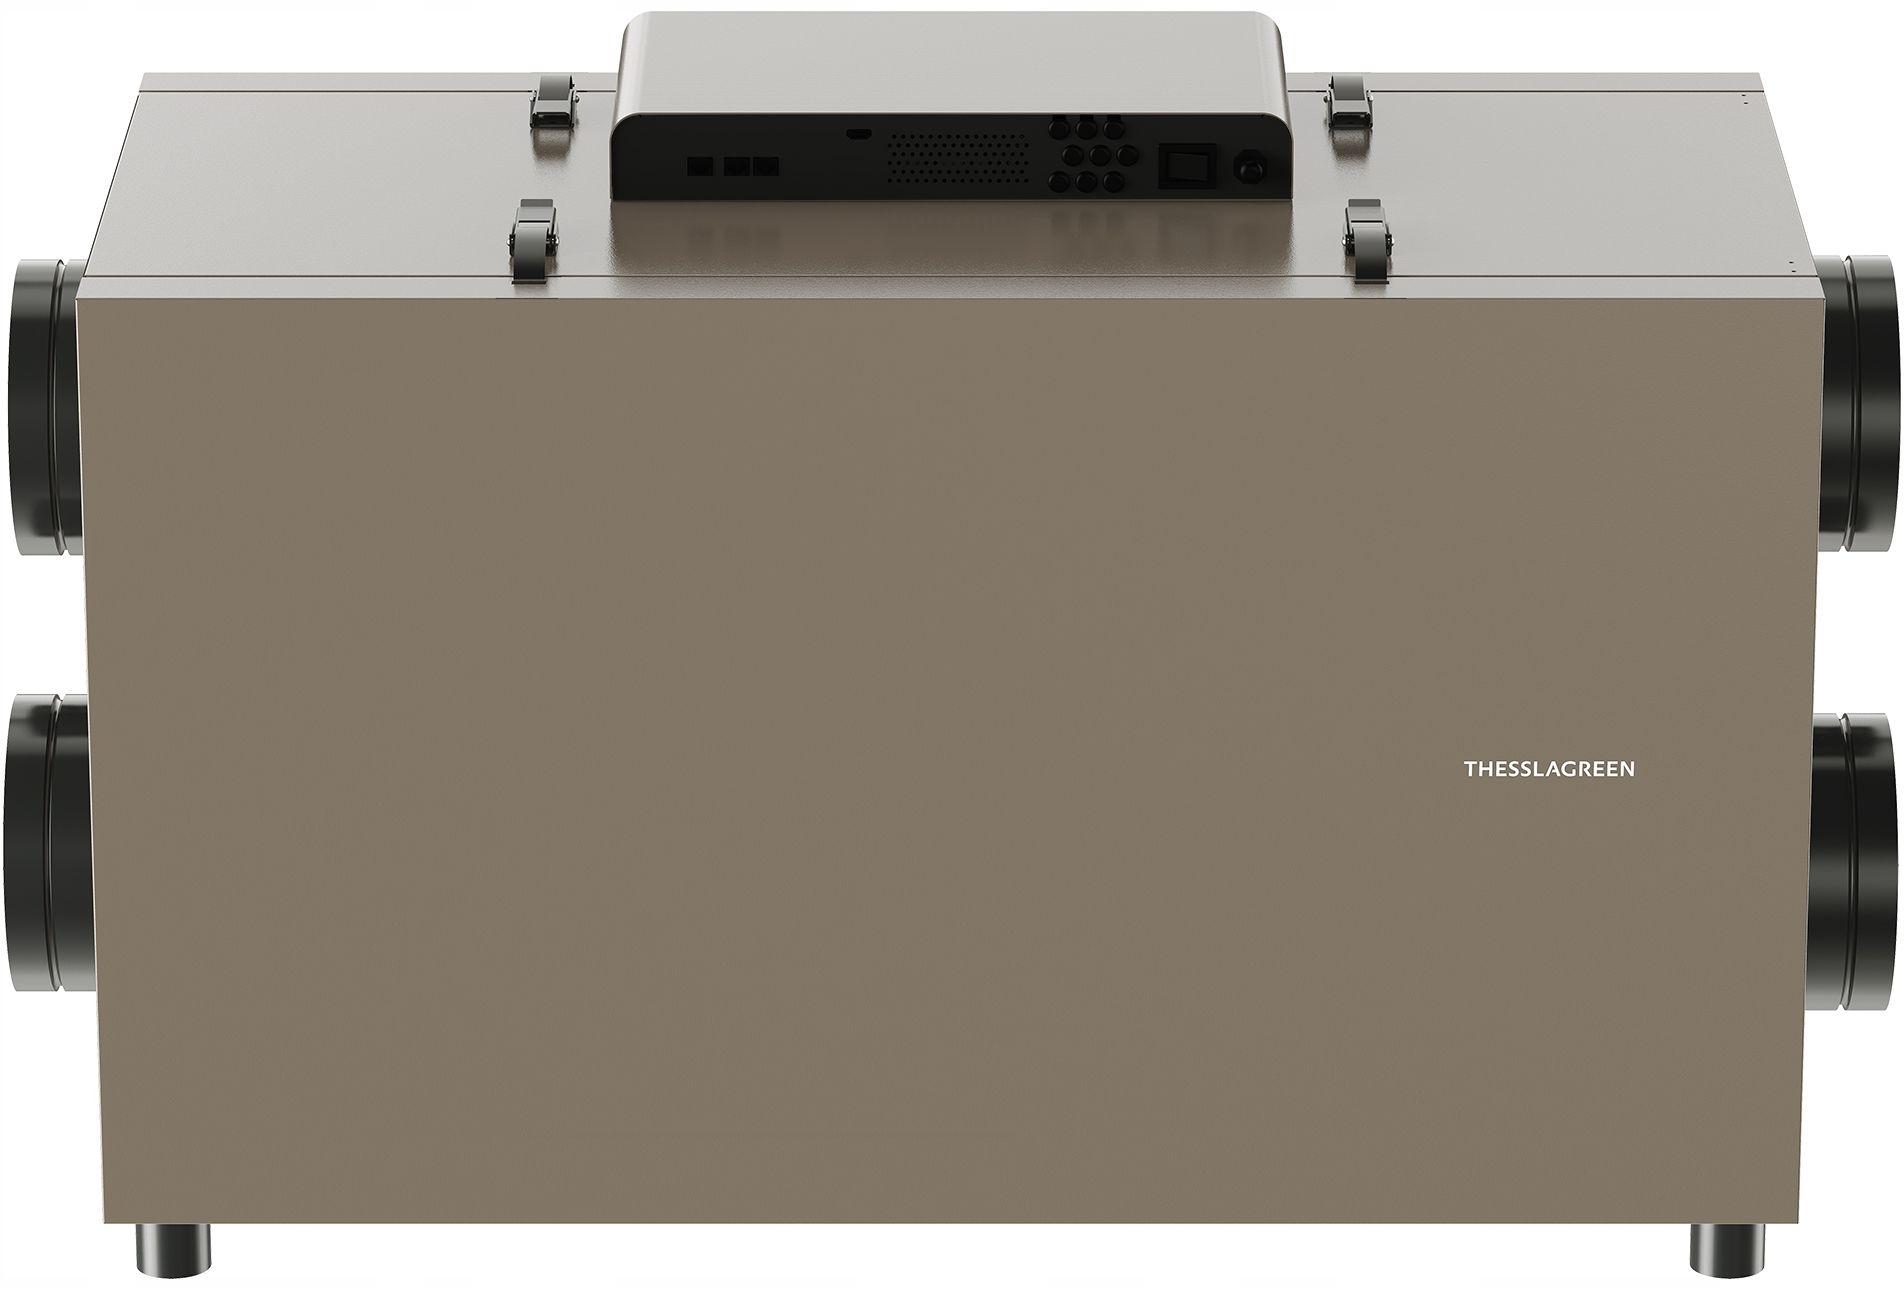 Rekuperator Thesslagreen AirPack Home 500h Energy+ Centrala rekuperacyjna Tesla Airpack Home 500h z modułem CF